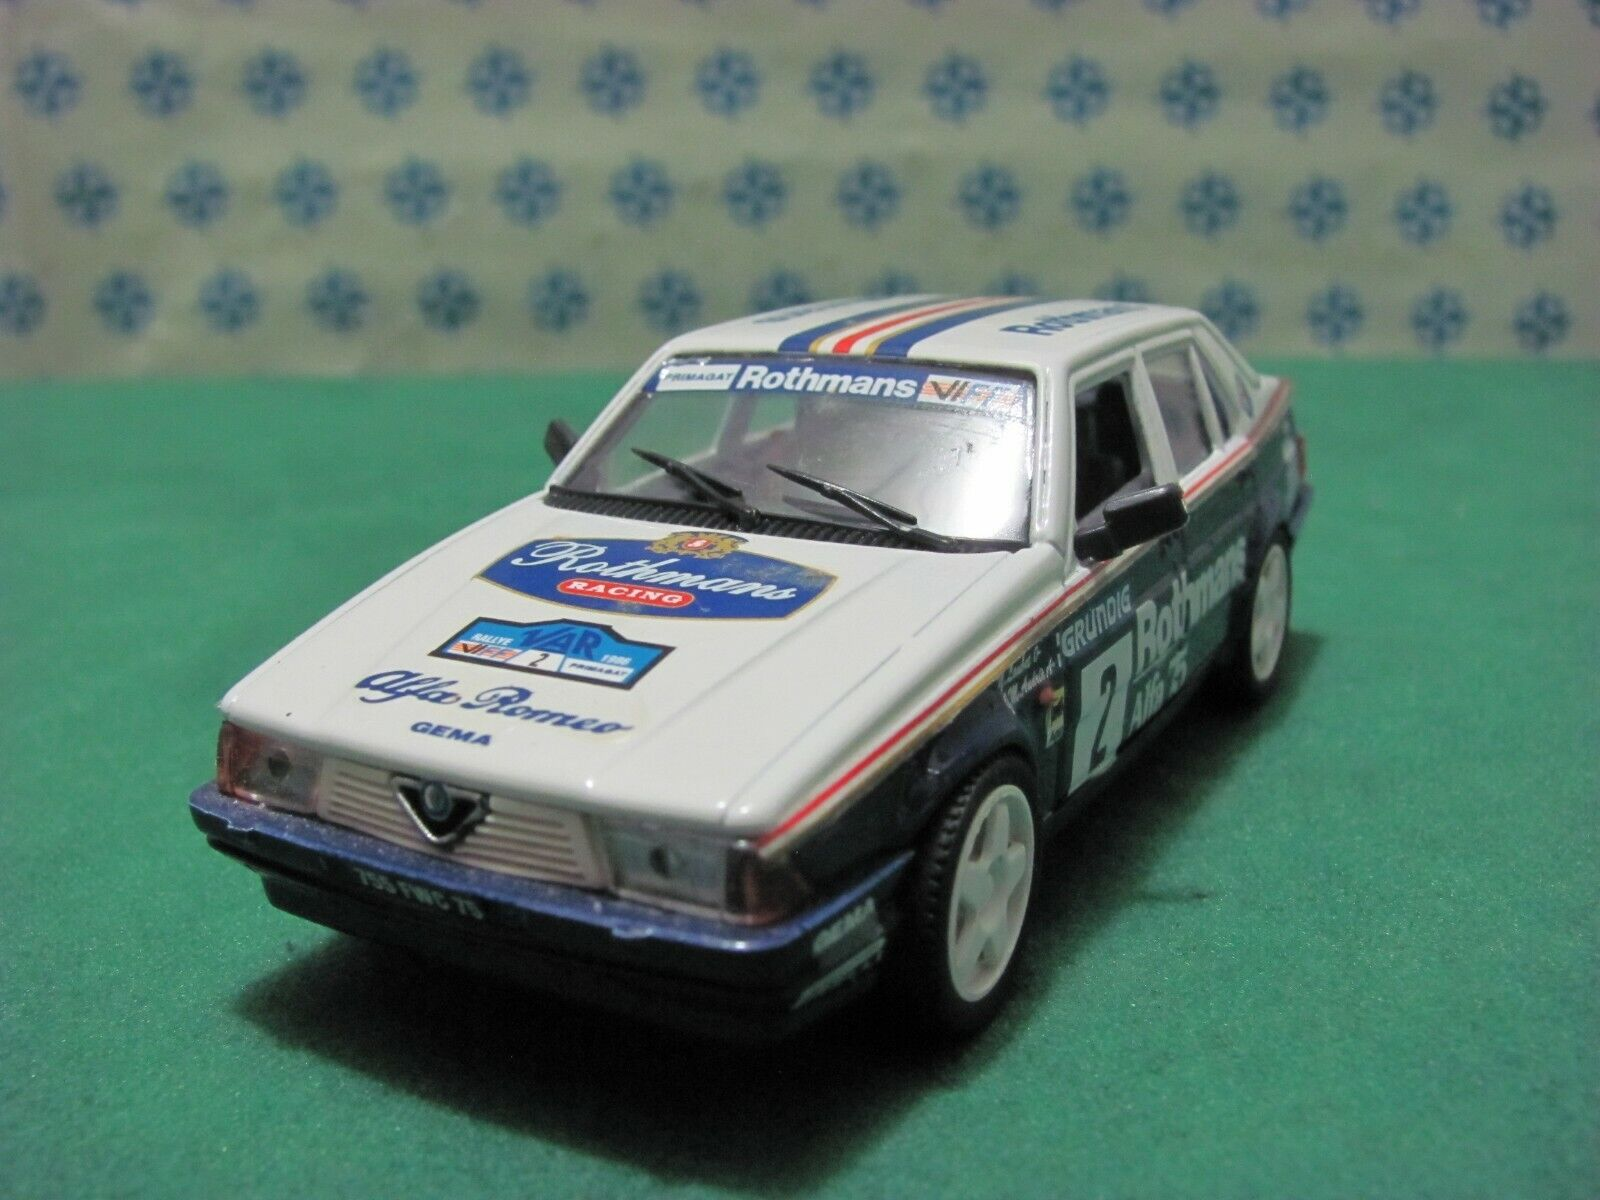 Alfa Romeo 75 1800 I Turbo 'redhmans' Rally Du Var 1989 - 1 43 Pk 2011 MIB